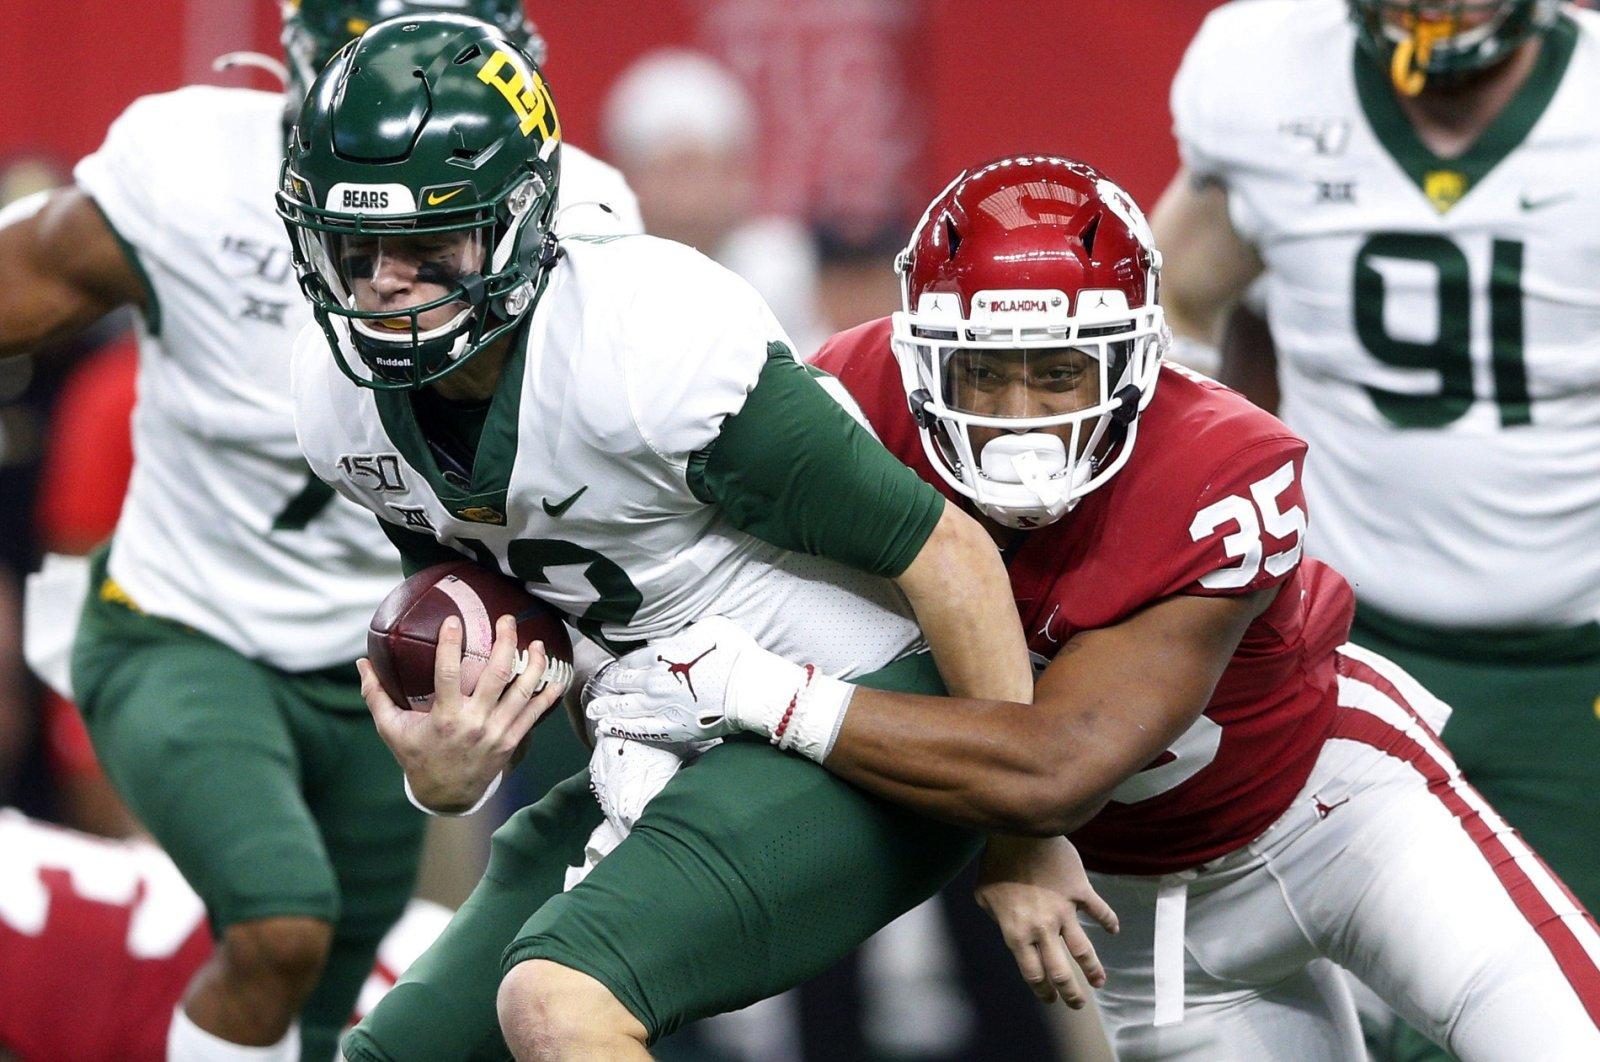 Oklahoma linebacker Nik Bonitto (35) sacks Baylor quarterback Charlie Brewer (12) during an NCAA college football game for the Big 12 Conference championship in Arlington, Texas, Dec. 7, 2019. (AP Photo)